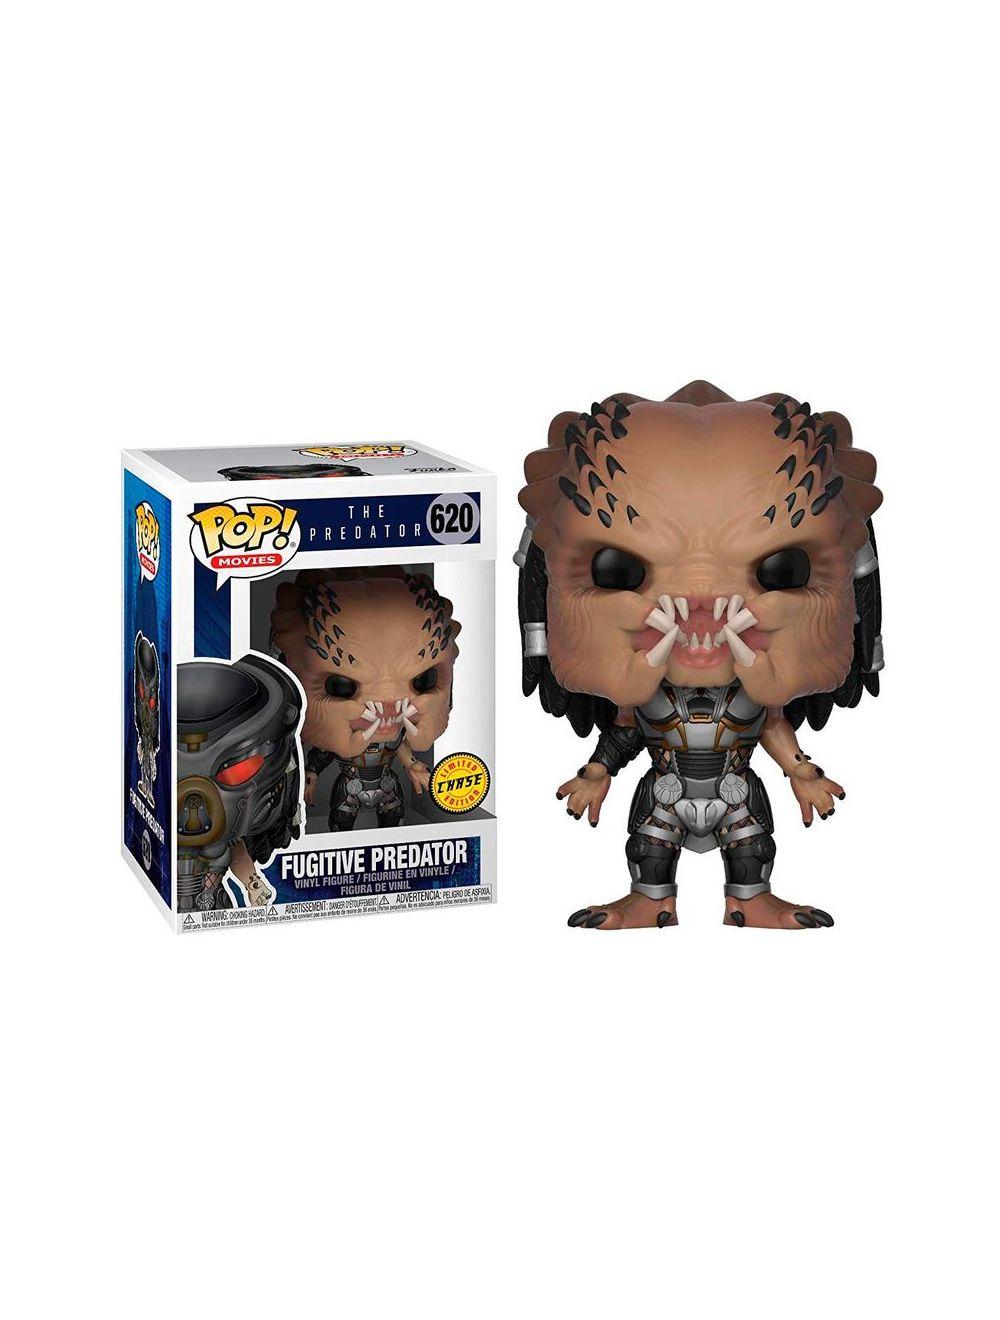 Funko POP! The Predator - Predator Chase Vinyl Figura 10cm